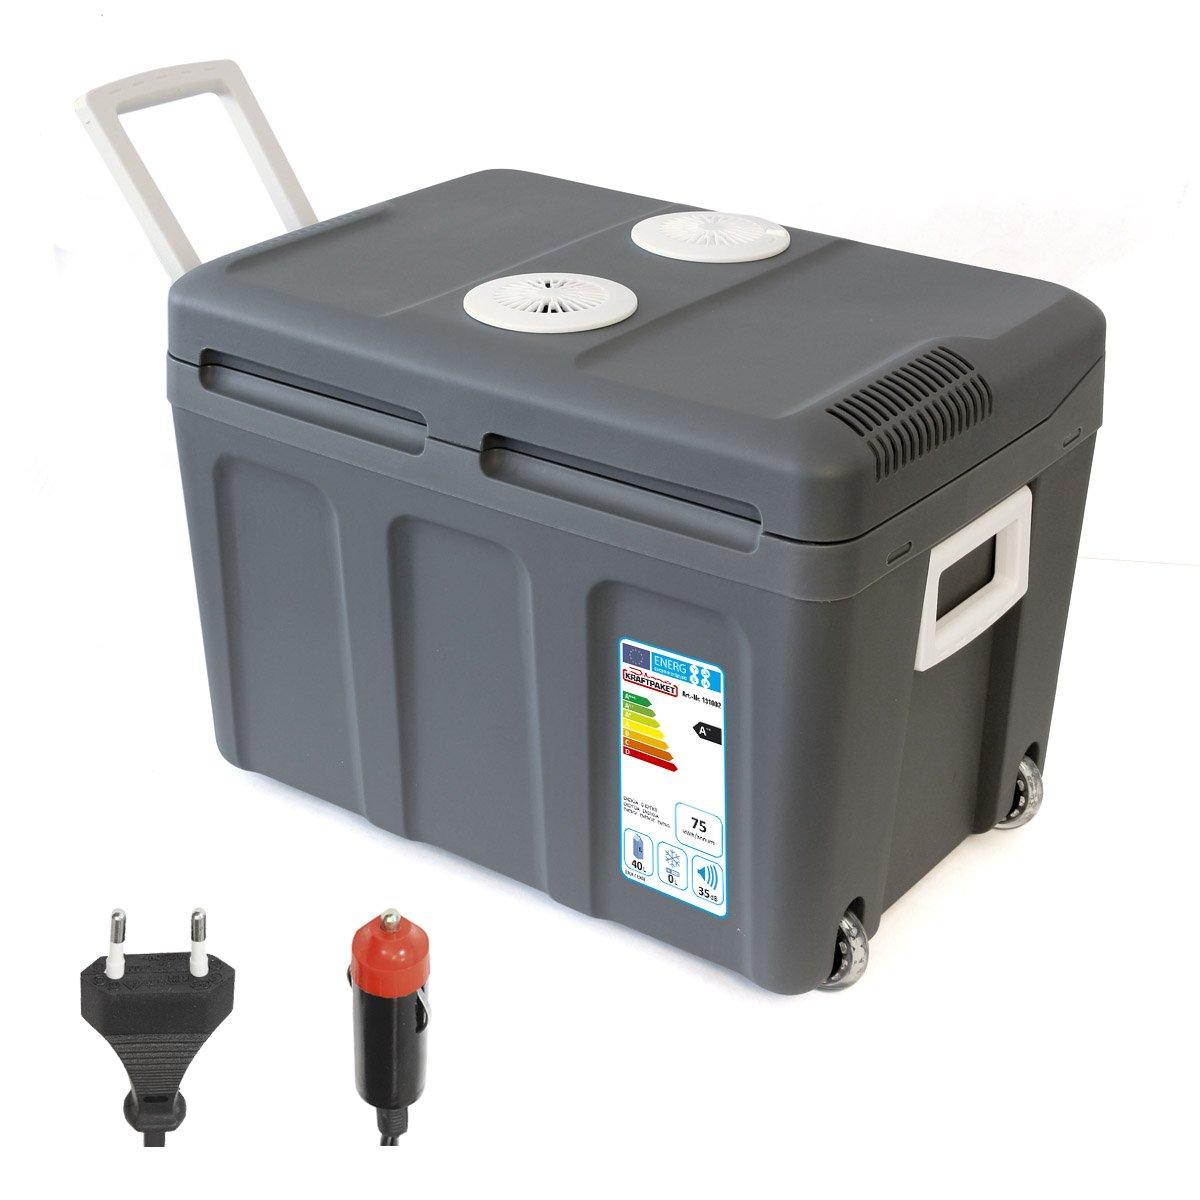 Dino KRAFTPAKET 131002 Kü hlbox 12V 230V (WÄ RMT & KÜ HLT) HÖ HE: 42cm GRÖ SSE: 45-Liter (40L netto) Elektrische Kü hlbox fü r Auto Boot Camping, A++ mit ECO-Modus [Energieklasse A++] r.d.i. Deutschland GmbH